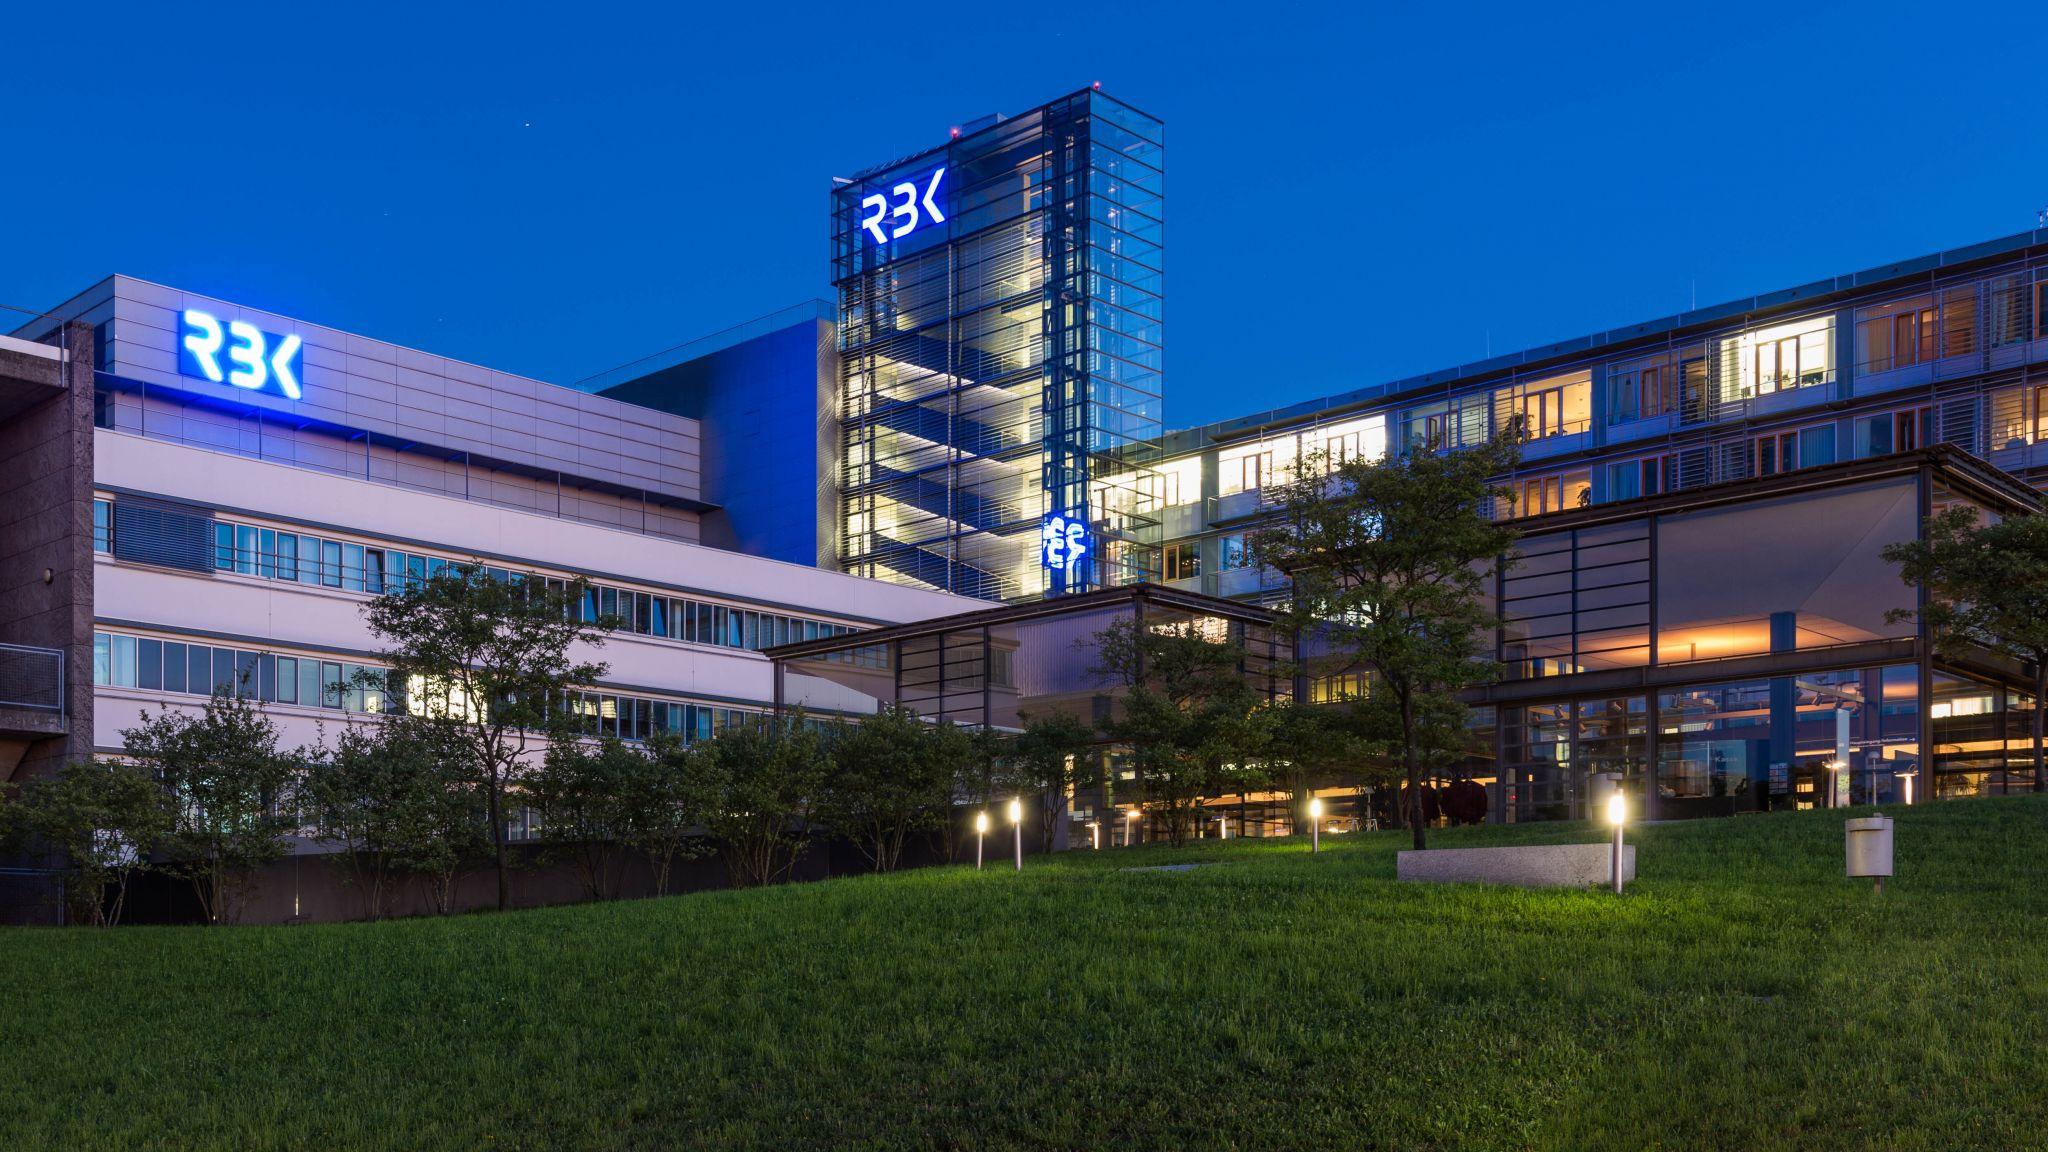 RBK (Robert Bosch Krankenhaus), Germany